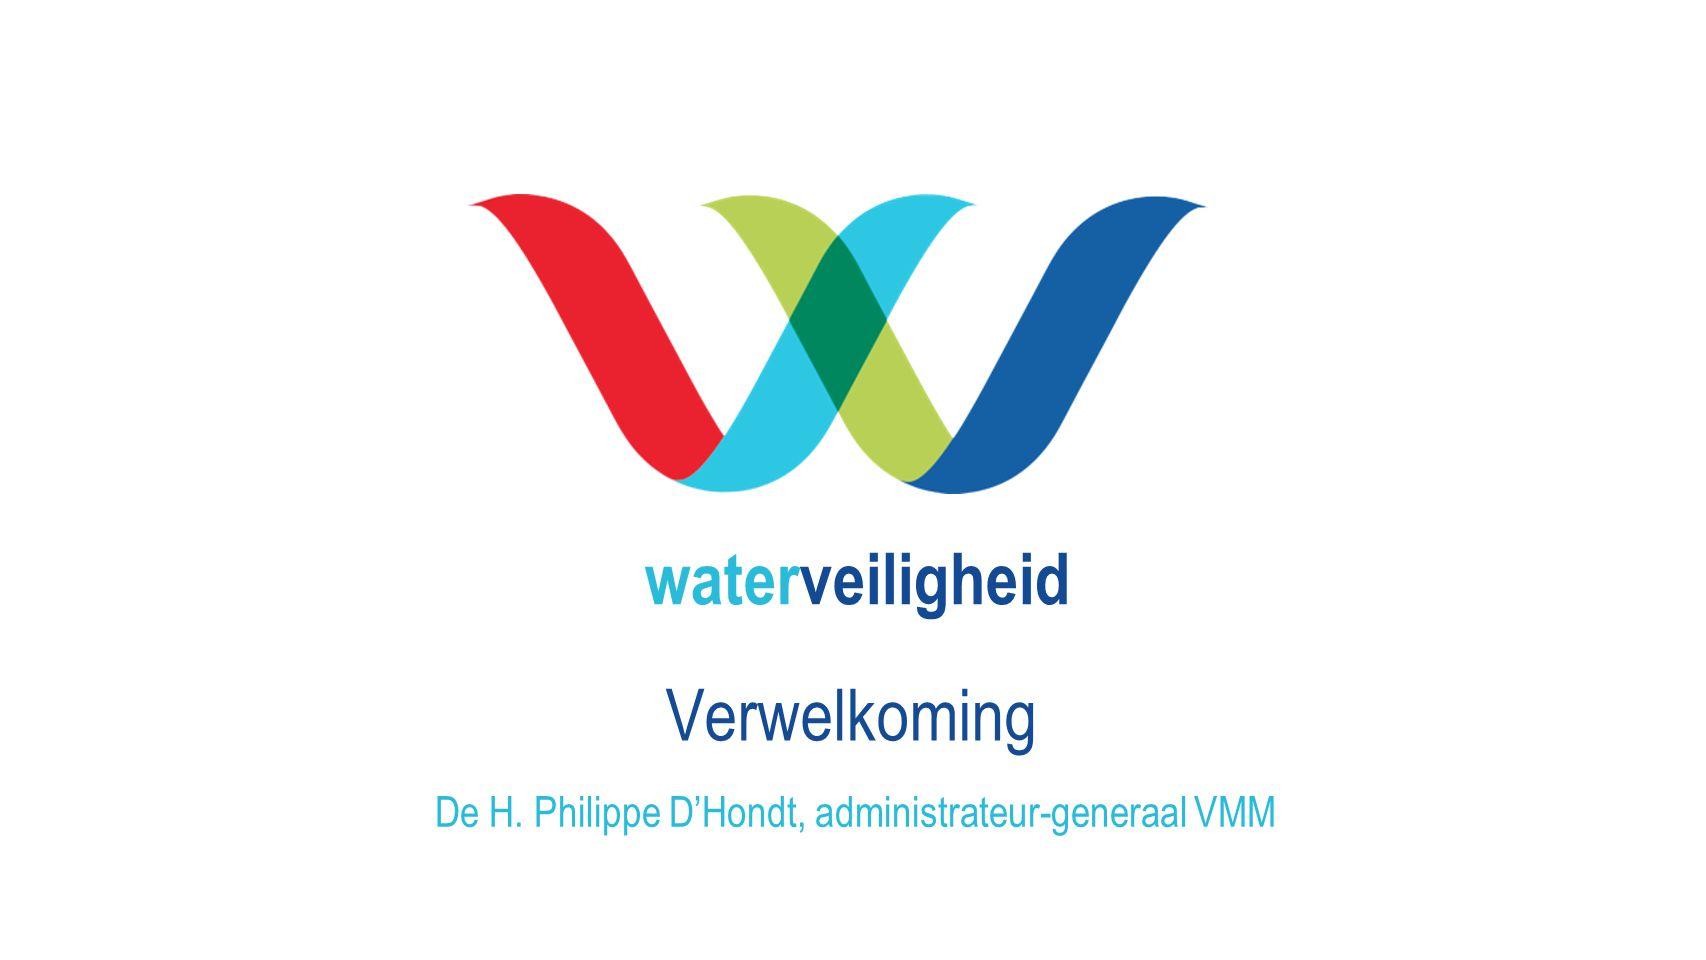 De H. Philippe D'Hondt, administrateur-generaal VMM